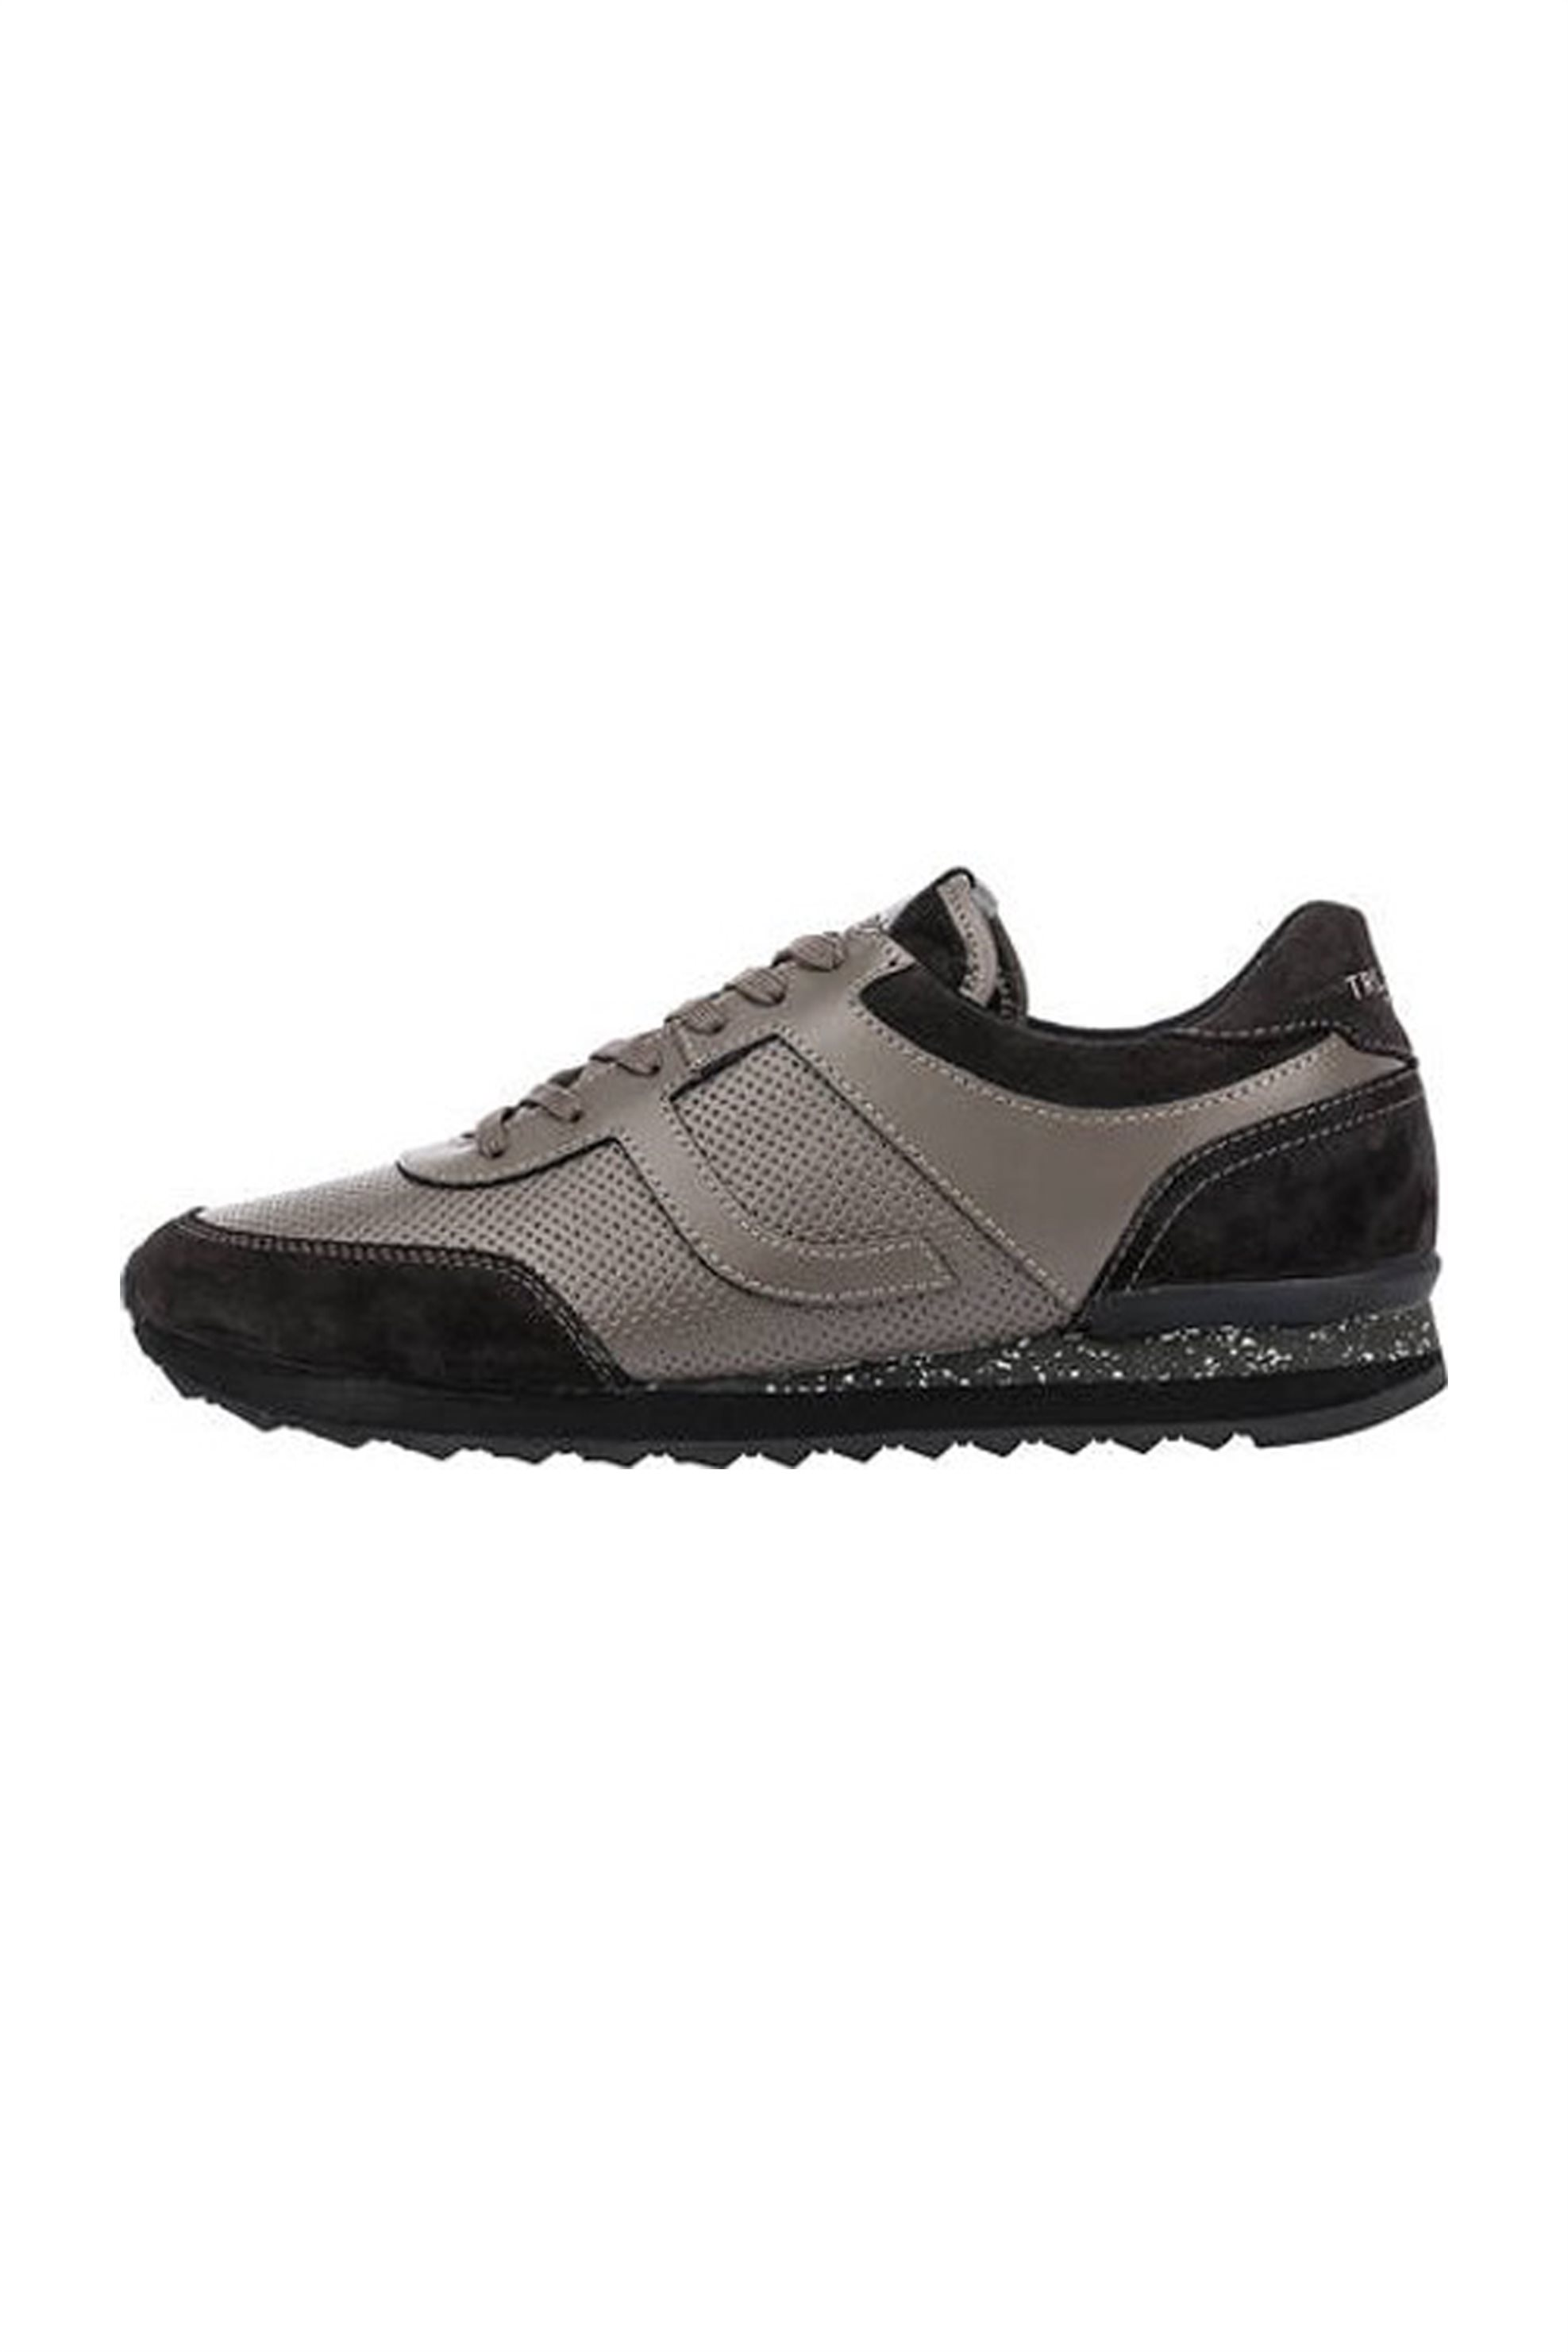 Trussardi ανδρικά sneakers με suede λεπτομέρειες και λογότυπο – 77A00104-9Y099999 – Γκρι